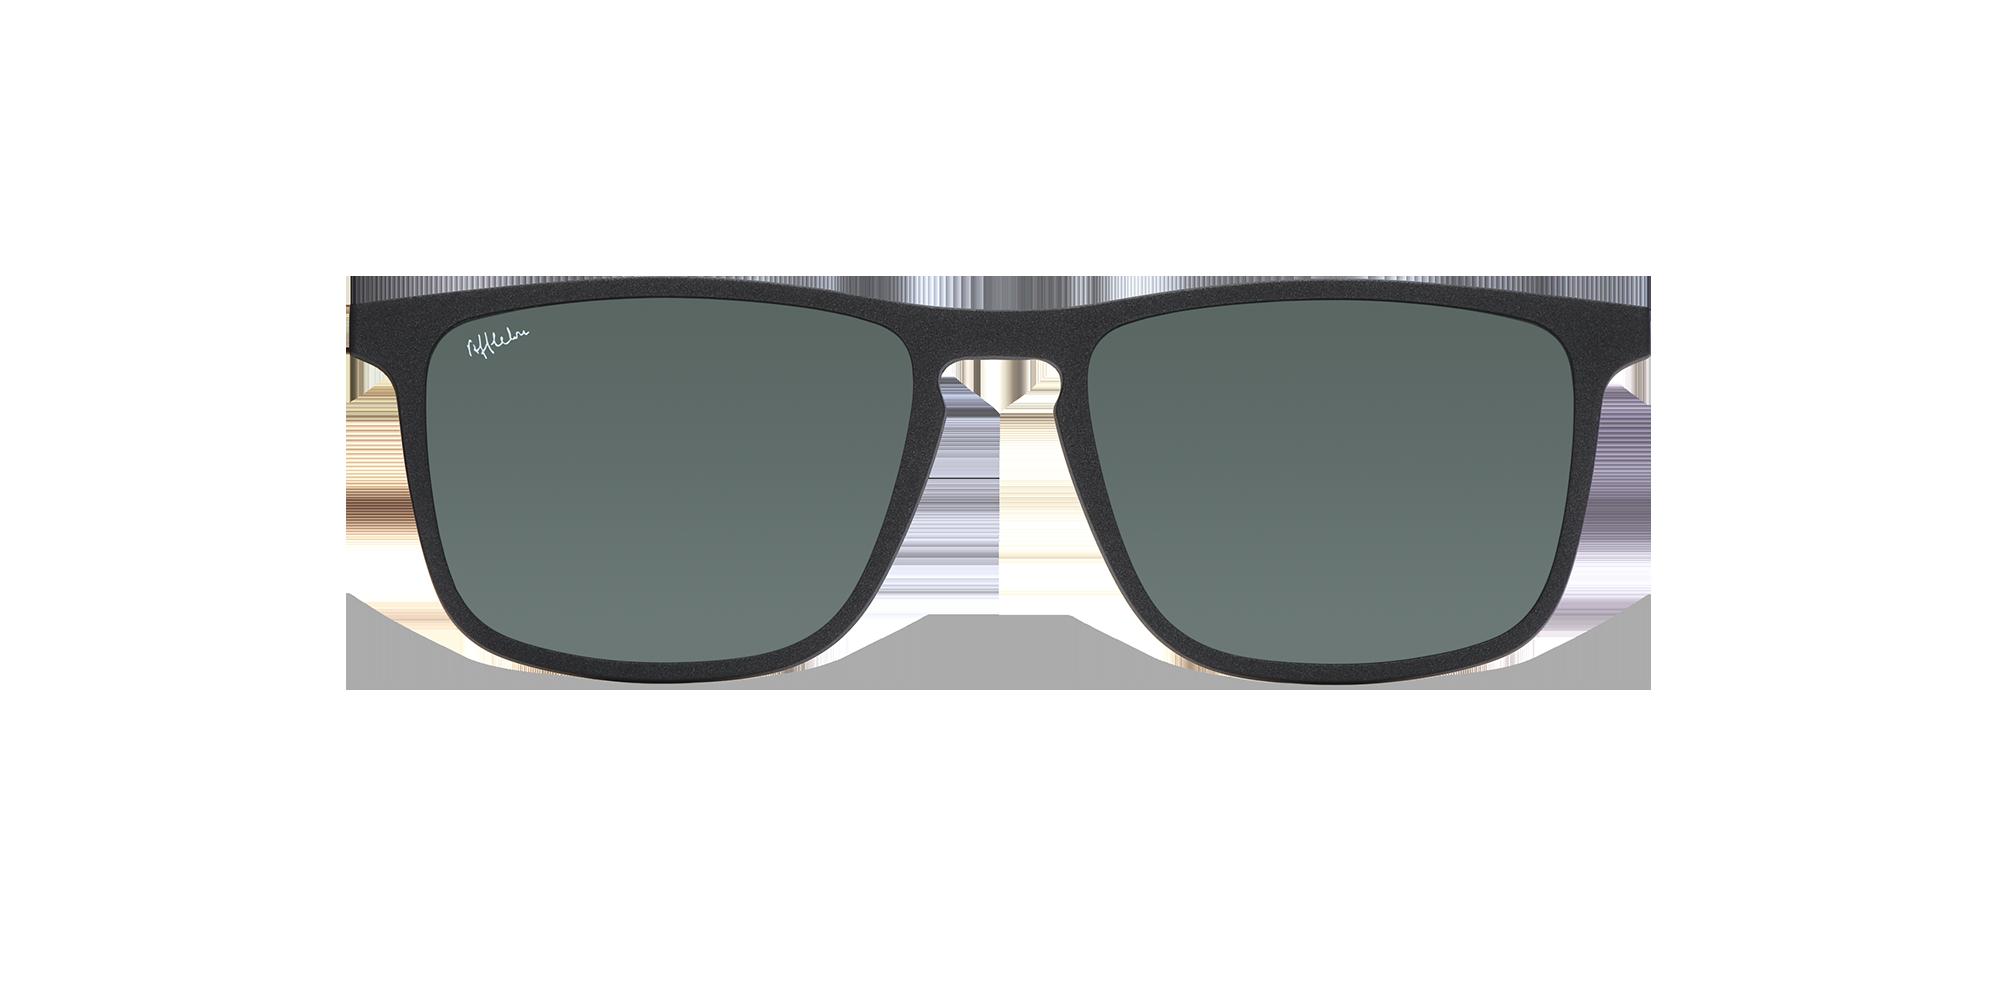 afflelou/france/products/smart_clip/clips_glasses/07630036428757_face.png